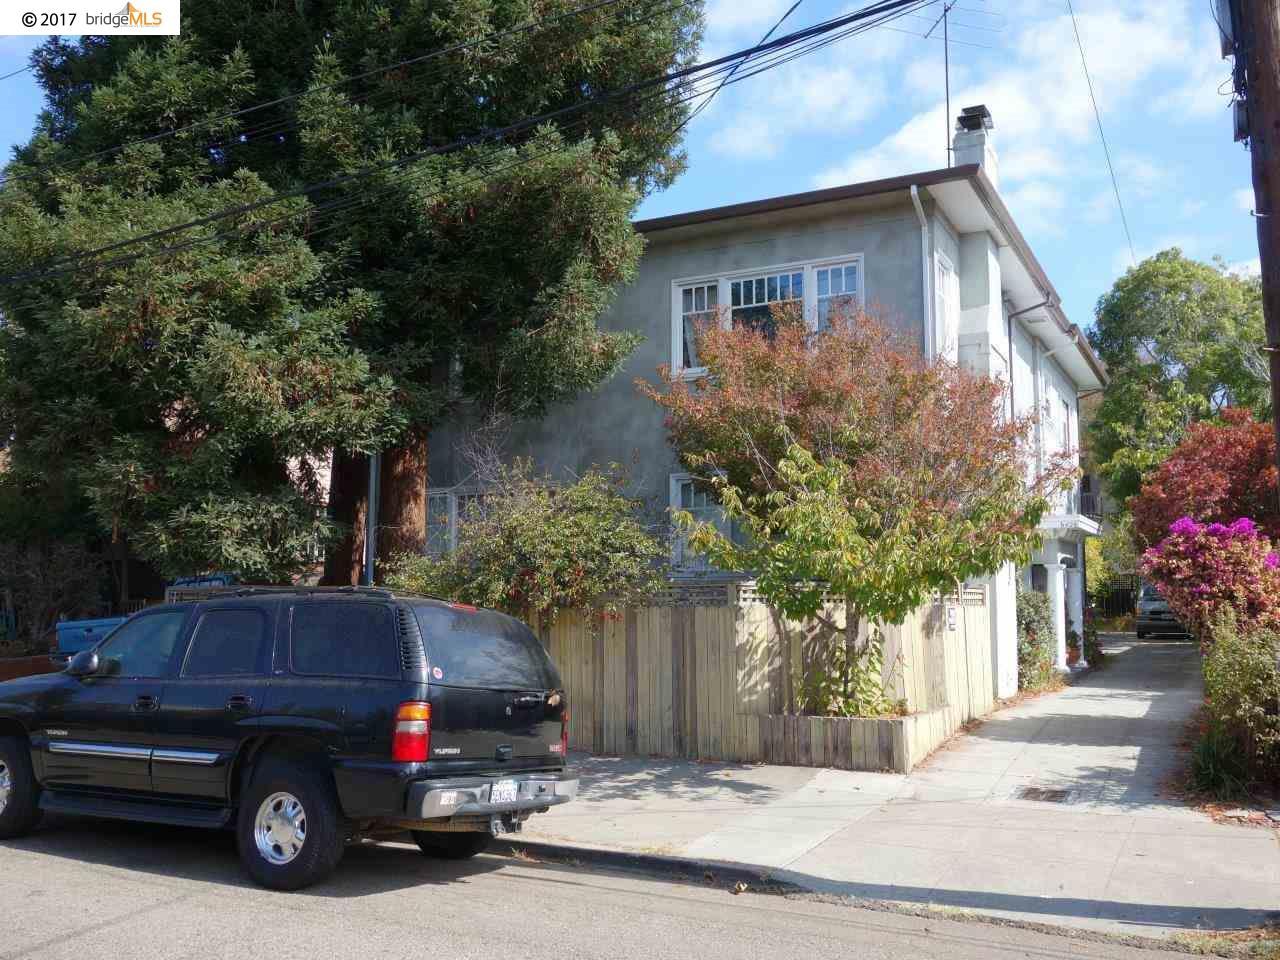 Multi-Family Home for Sale at 6426 Benvenue Avenue Oakland, California 94618 United States